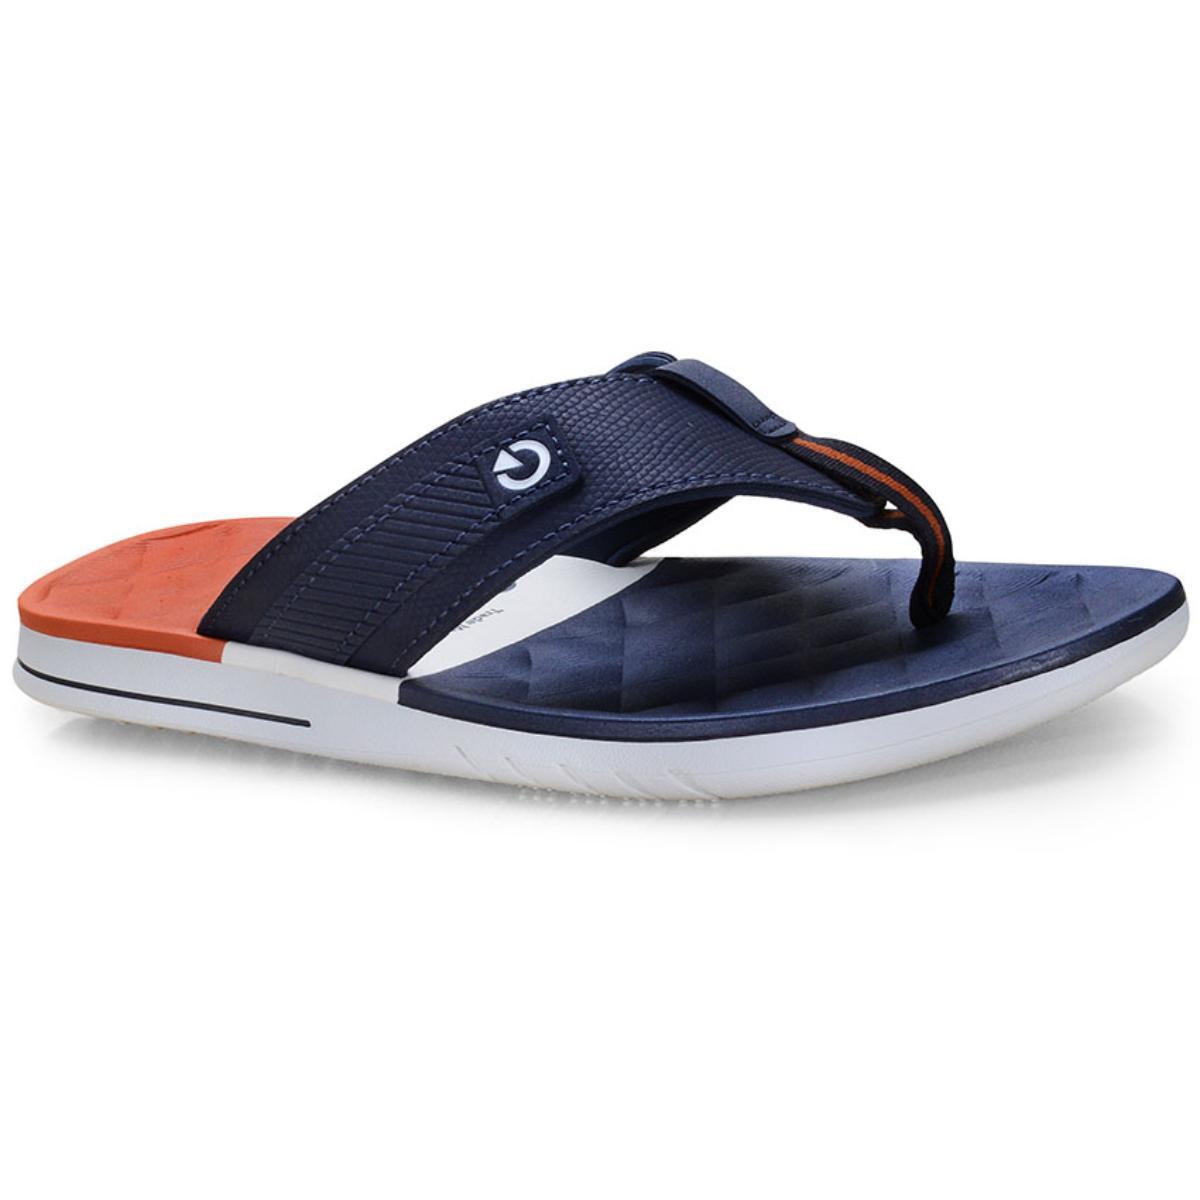 Chinelo Masculino Grendene 11333 24799 Cartago Sevilha iv Branco/azul/vermelho